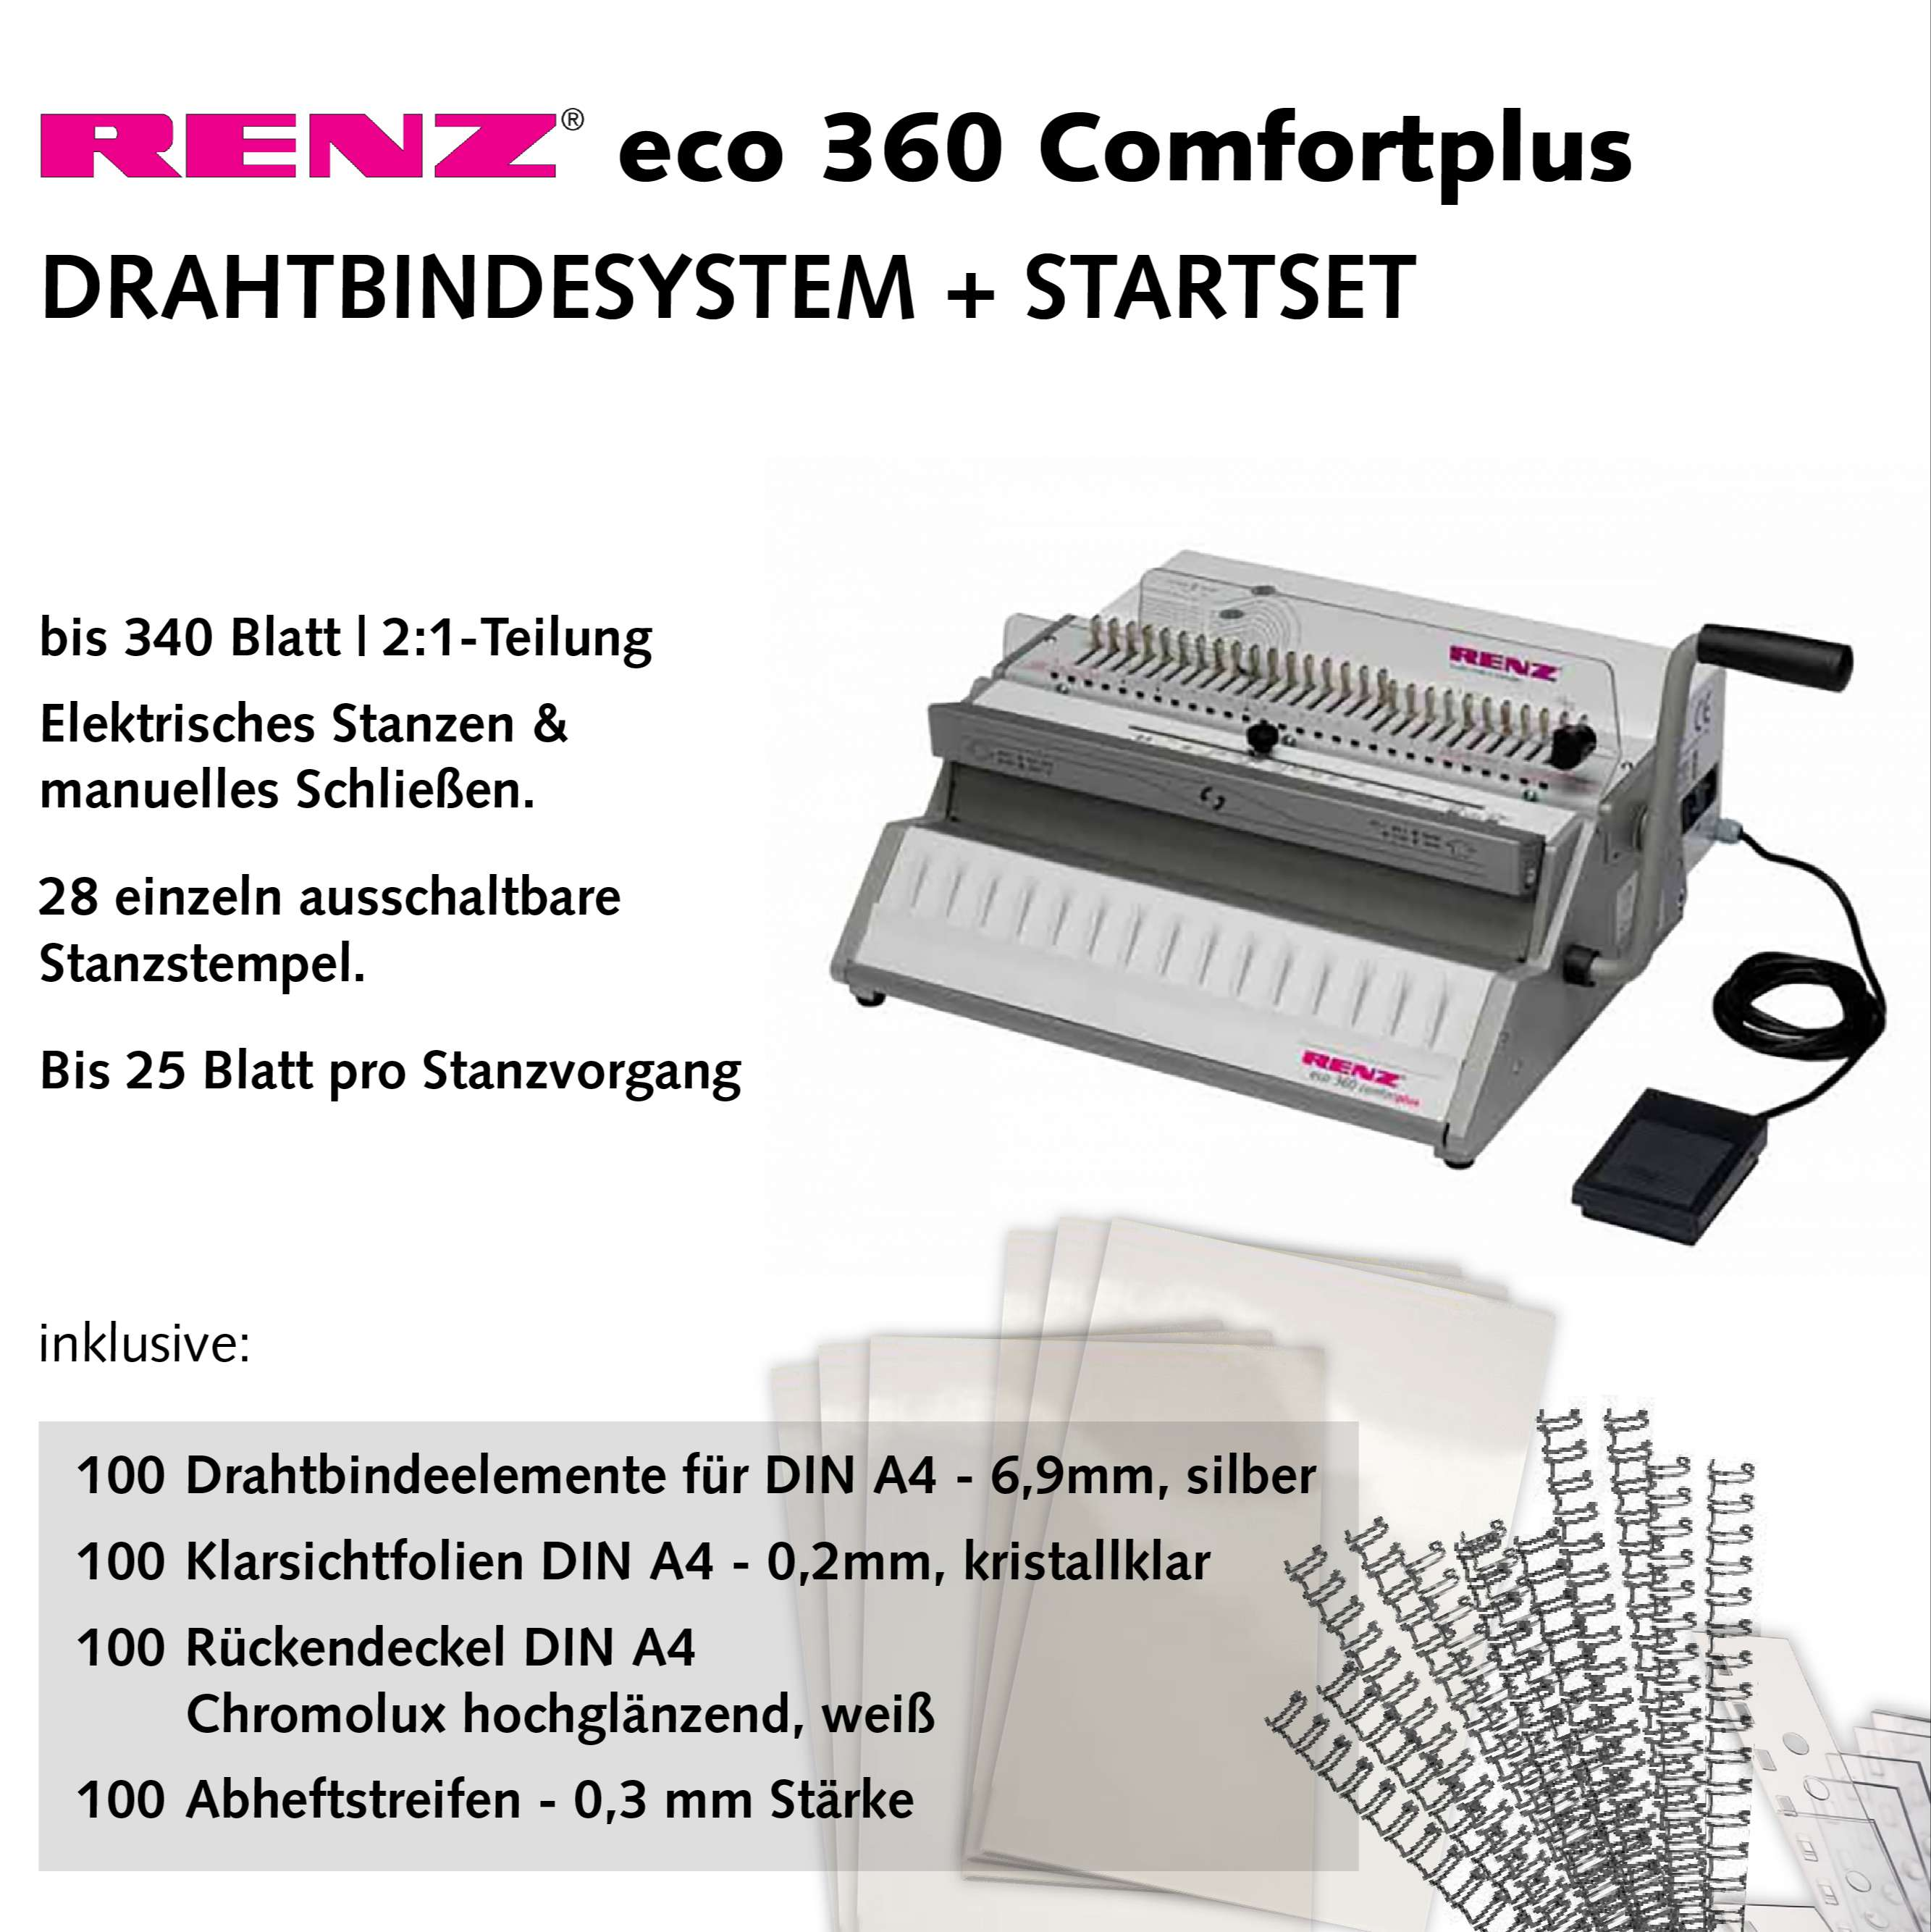 RENZ eco 360 comfortplus